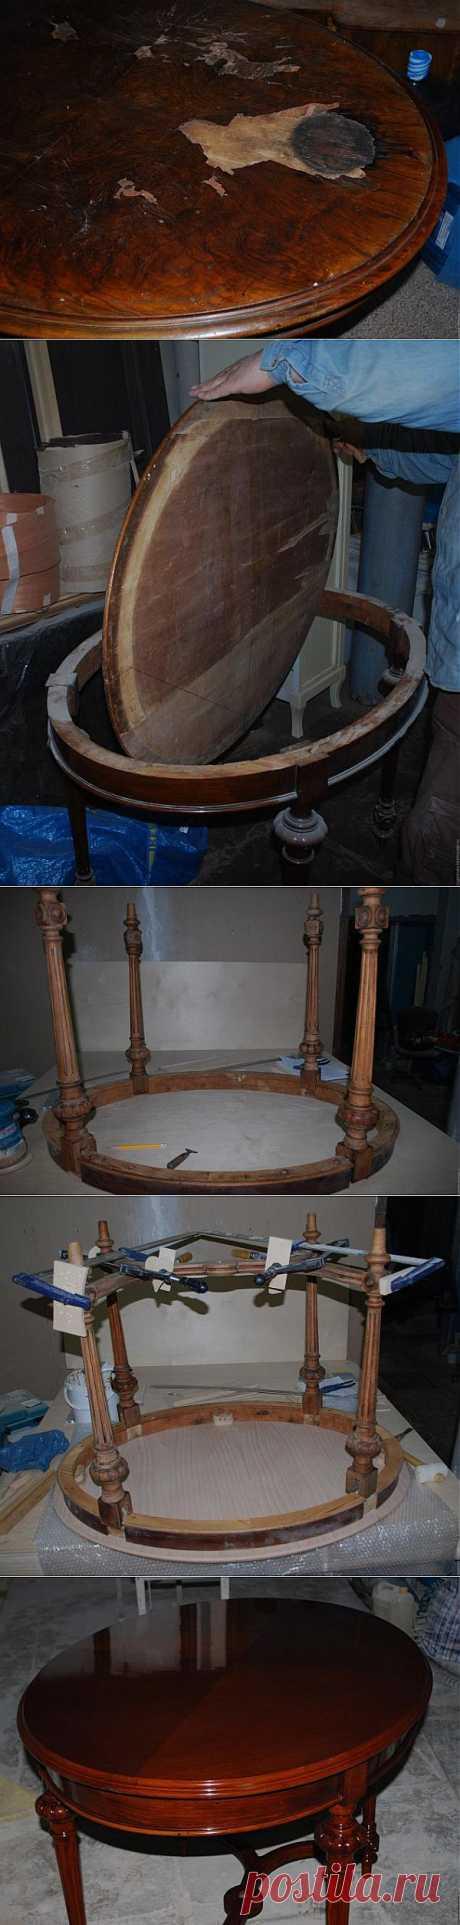 Реставрация стола - Ярмарка Мастеров - ручная работа, handmade